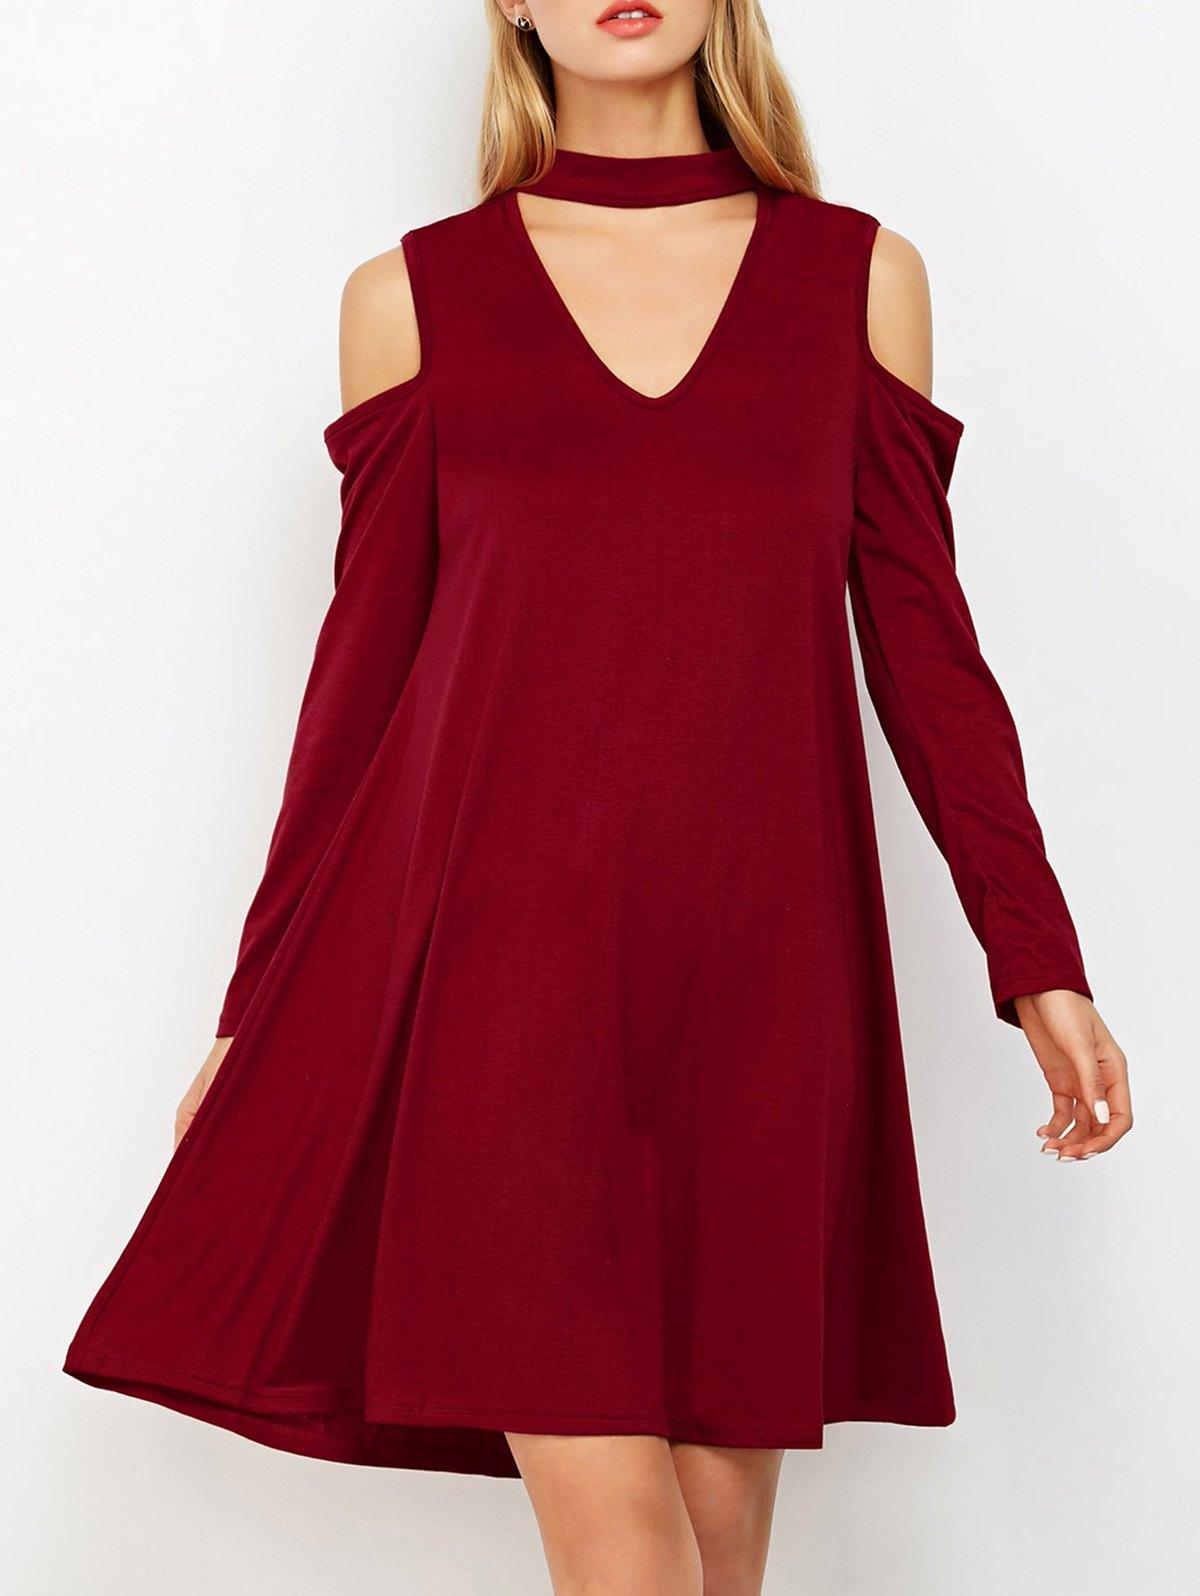 Cold Shoulder Choker Swing Dress